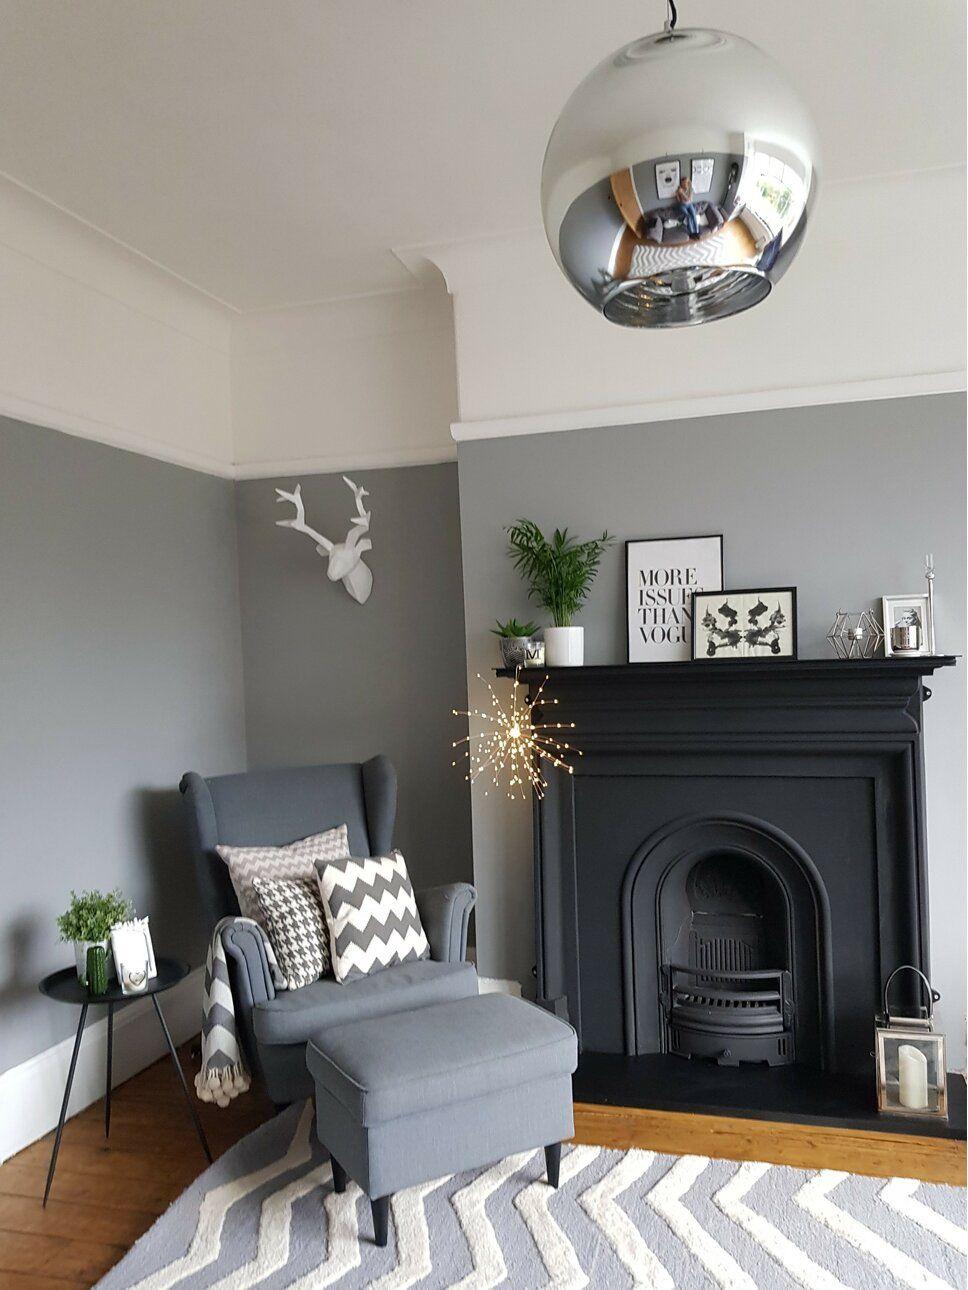 Decorate A Room Online: Shop Furniture, Lighting, Homeware & More